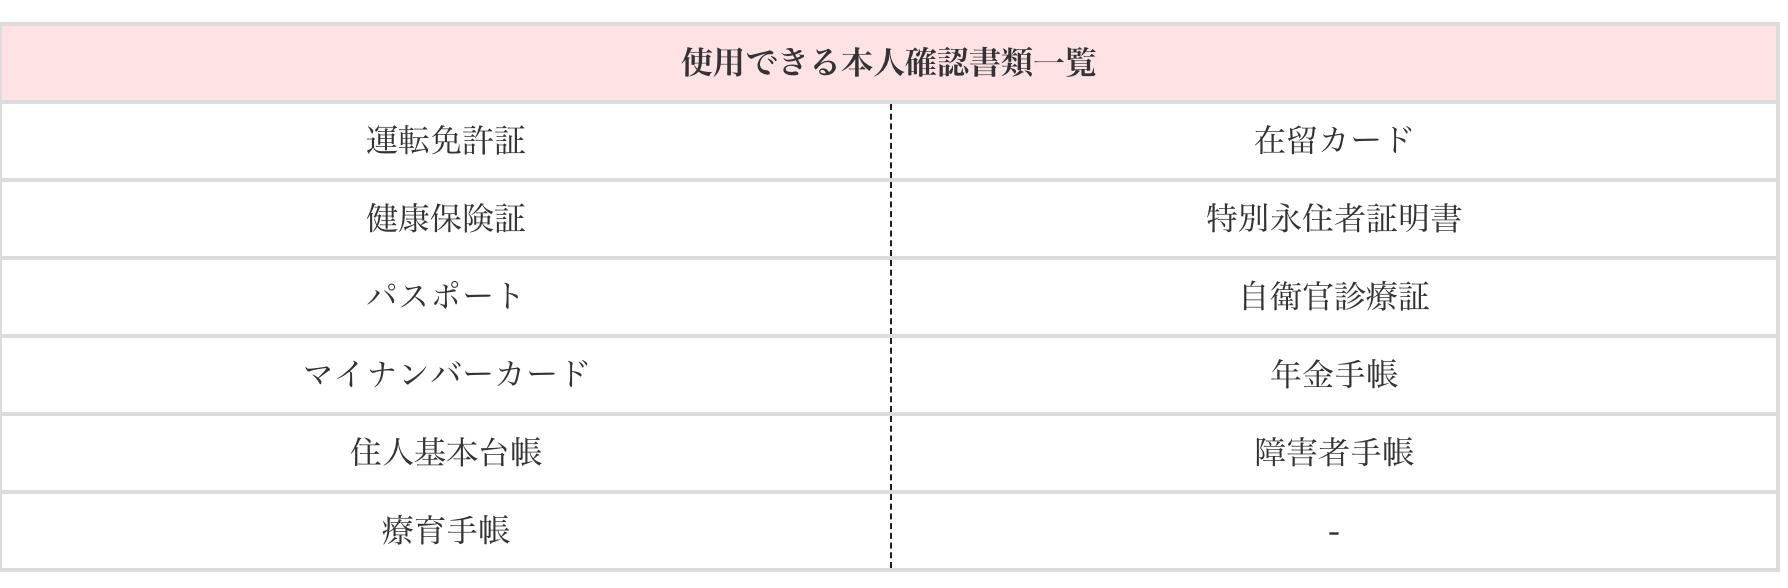 with 本人確認